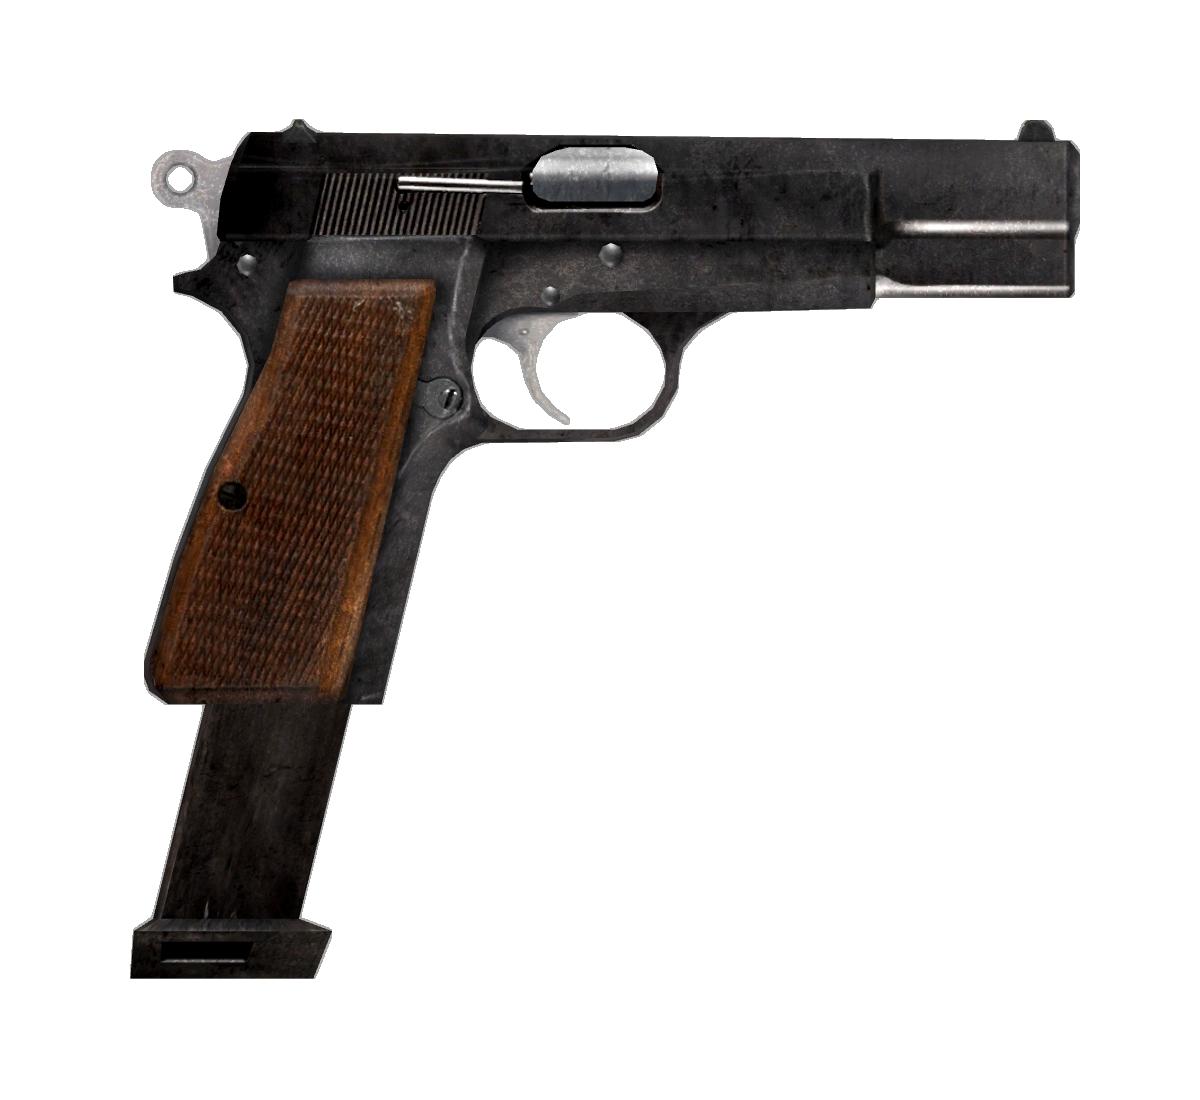 image ammunition clip 9mm #109500913